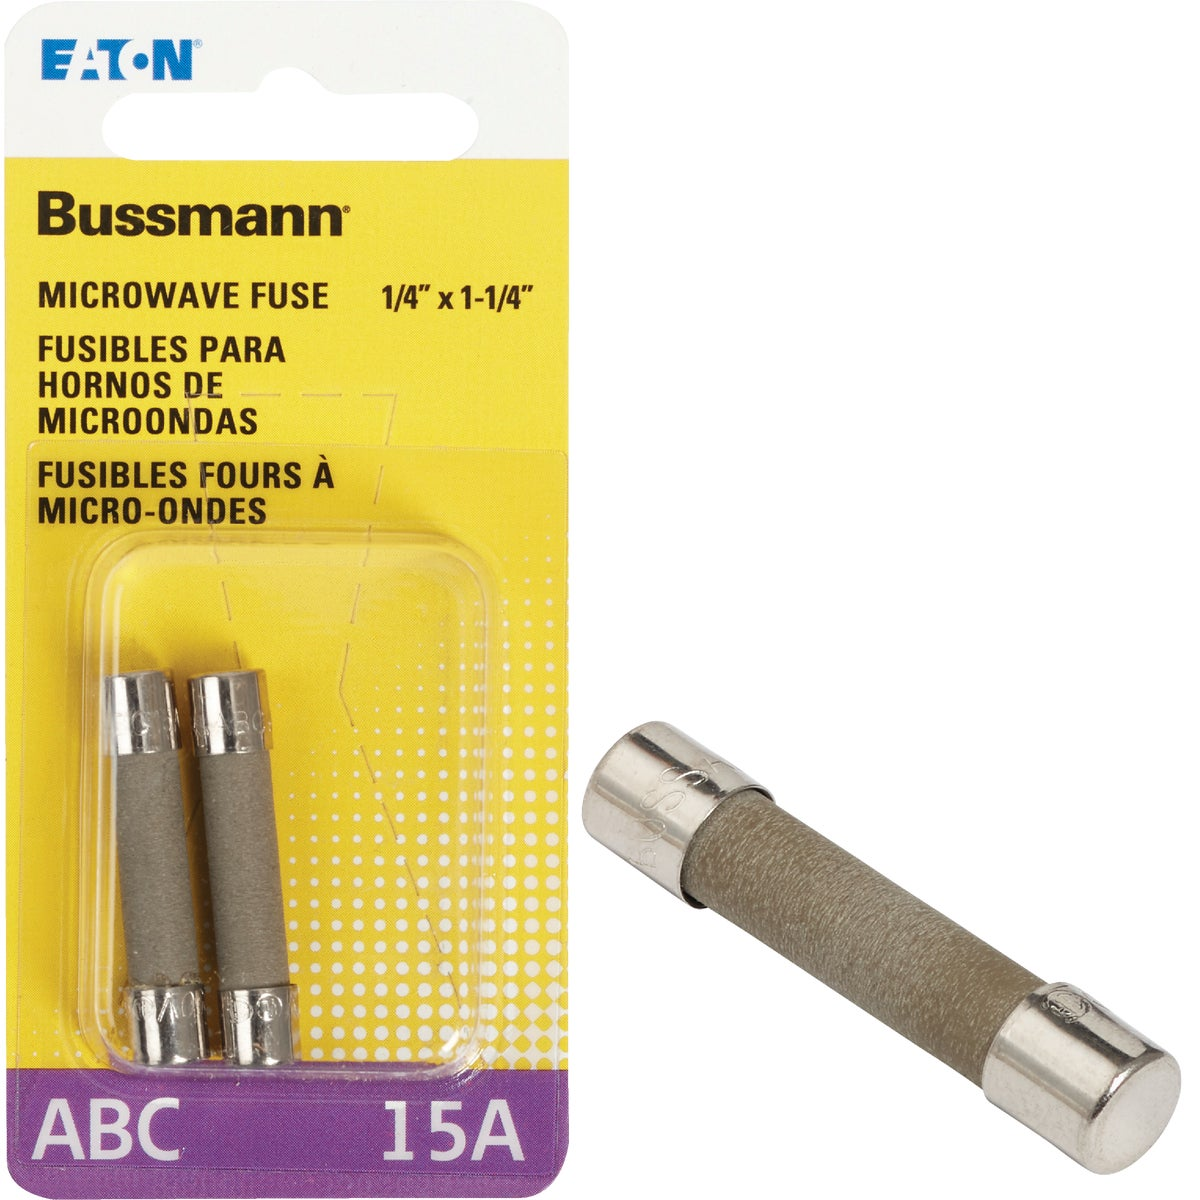 Bussmann 15A ABC Ceramic Tube Electronic Fuse (2-Pack)